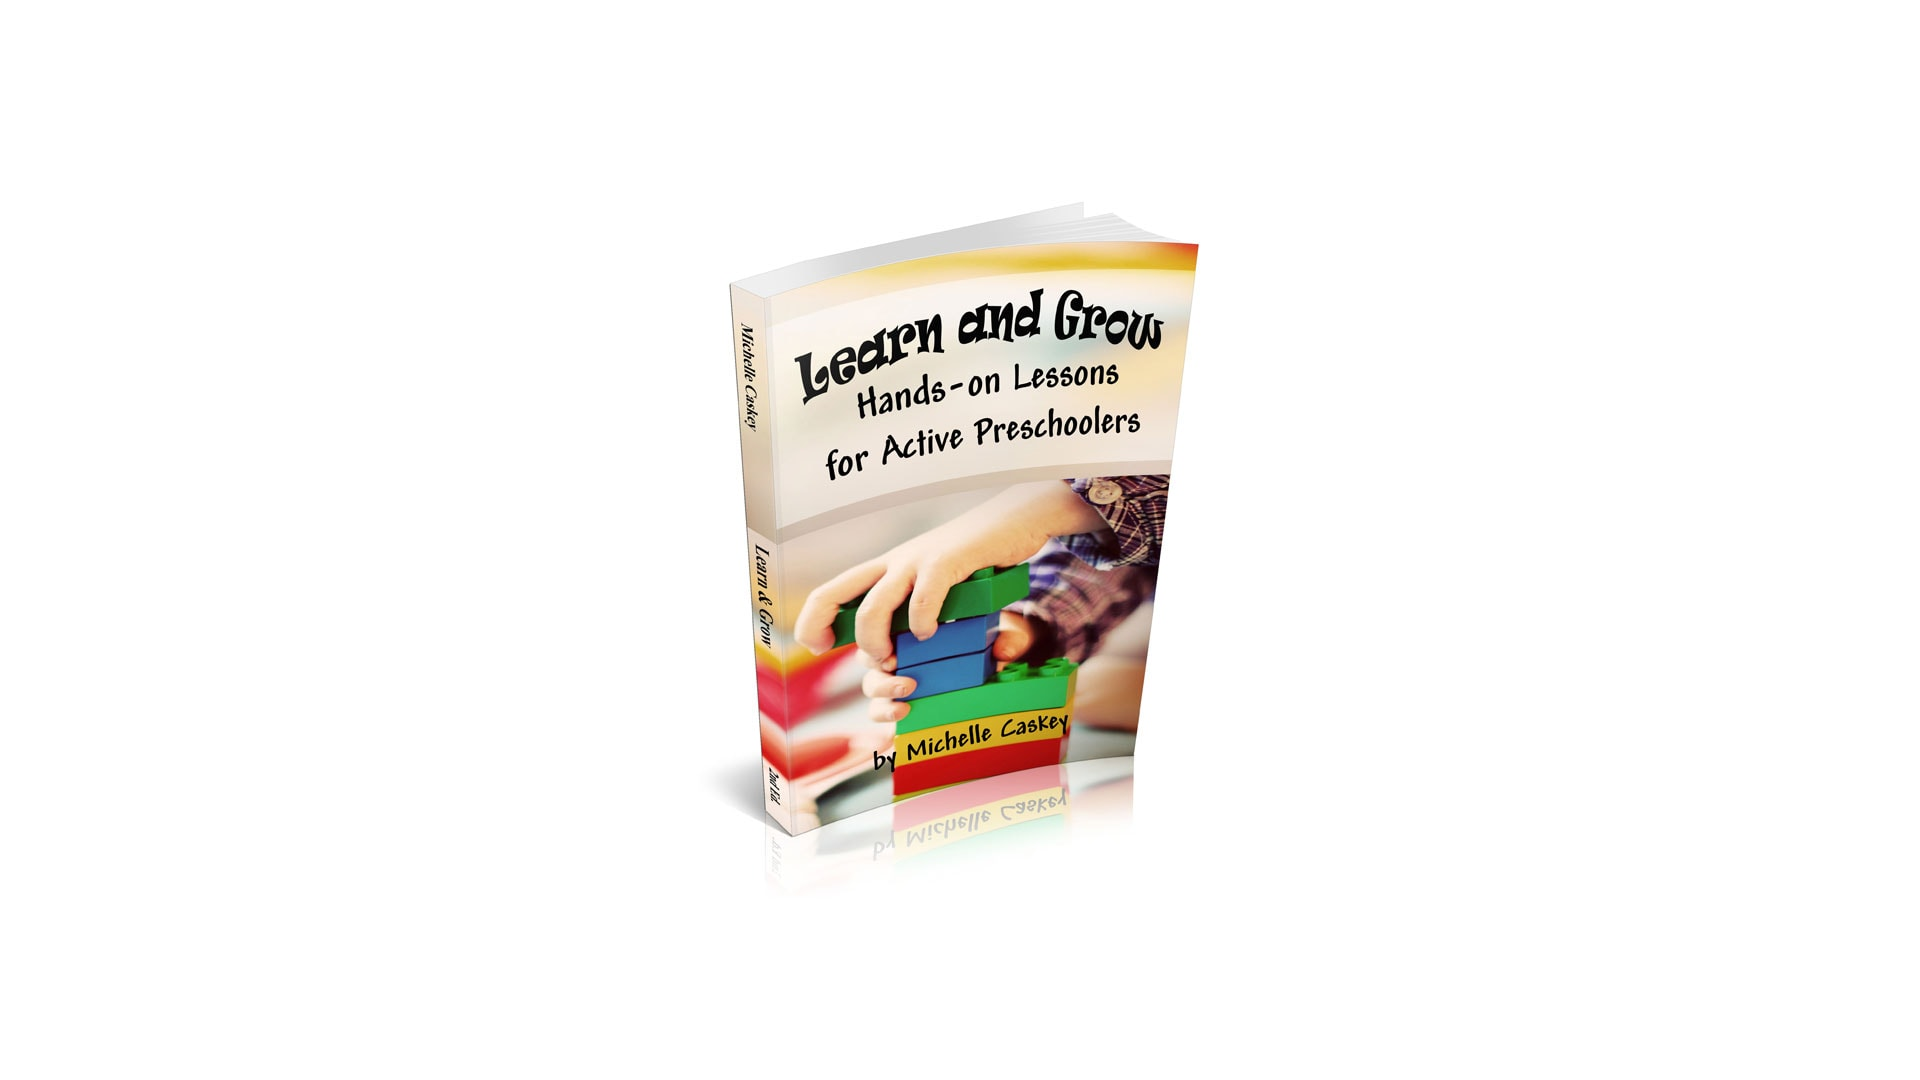 Learn and Grow Customer Reviews